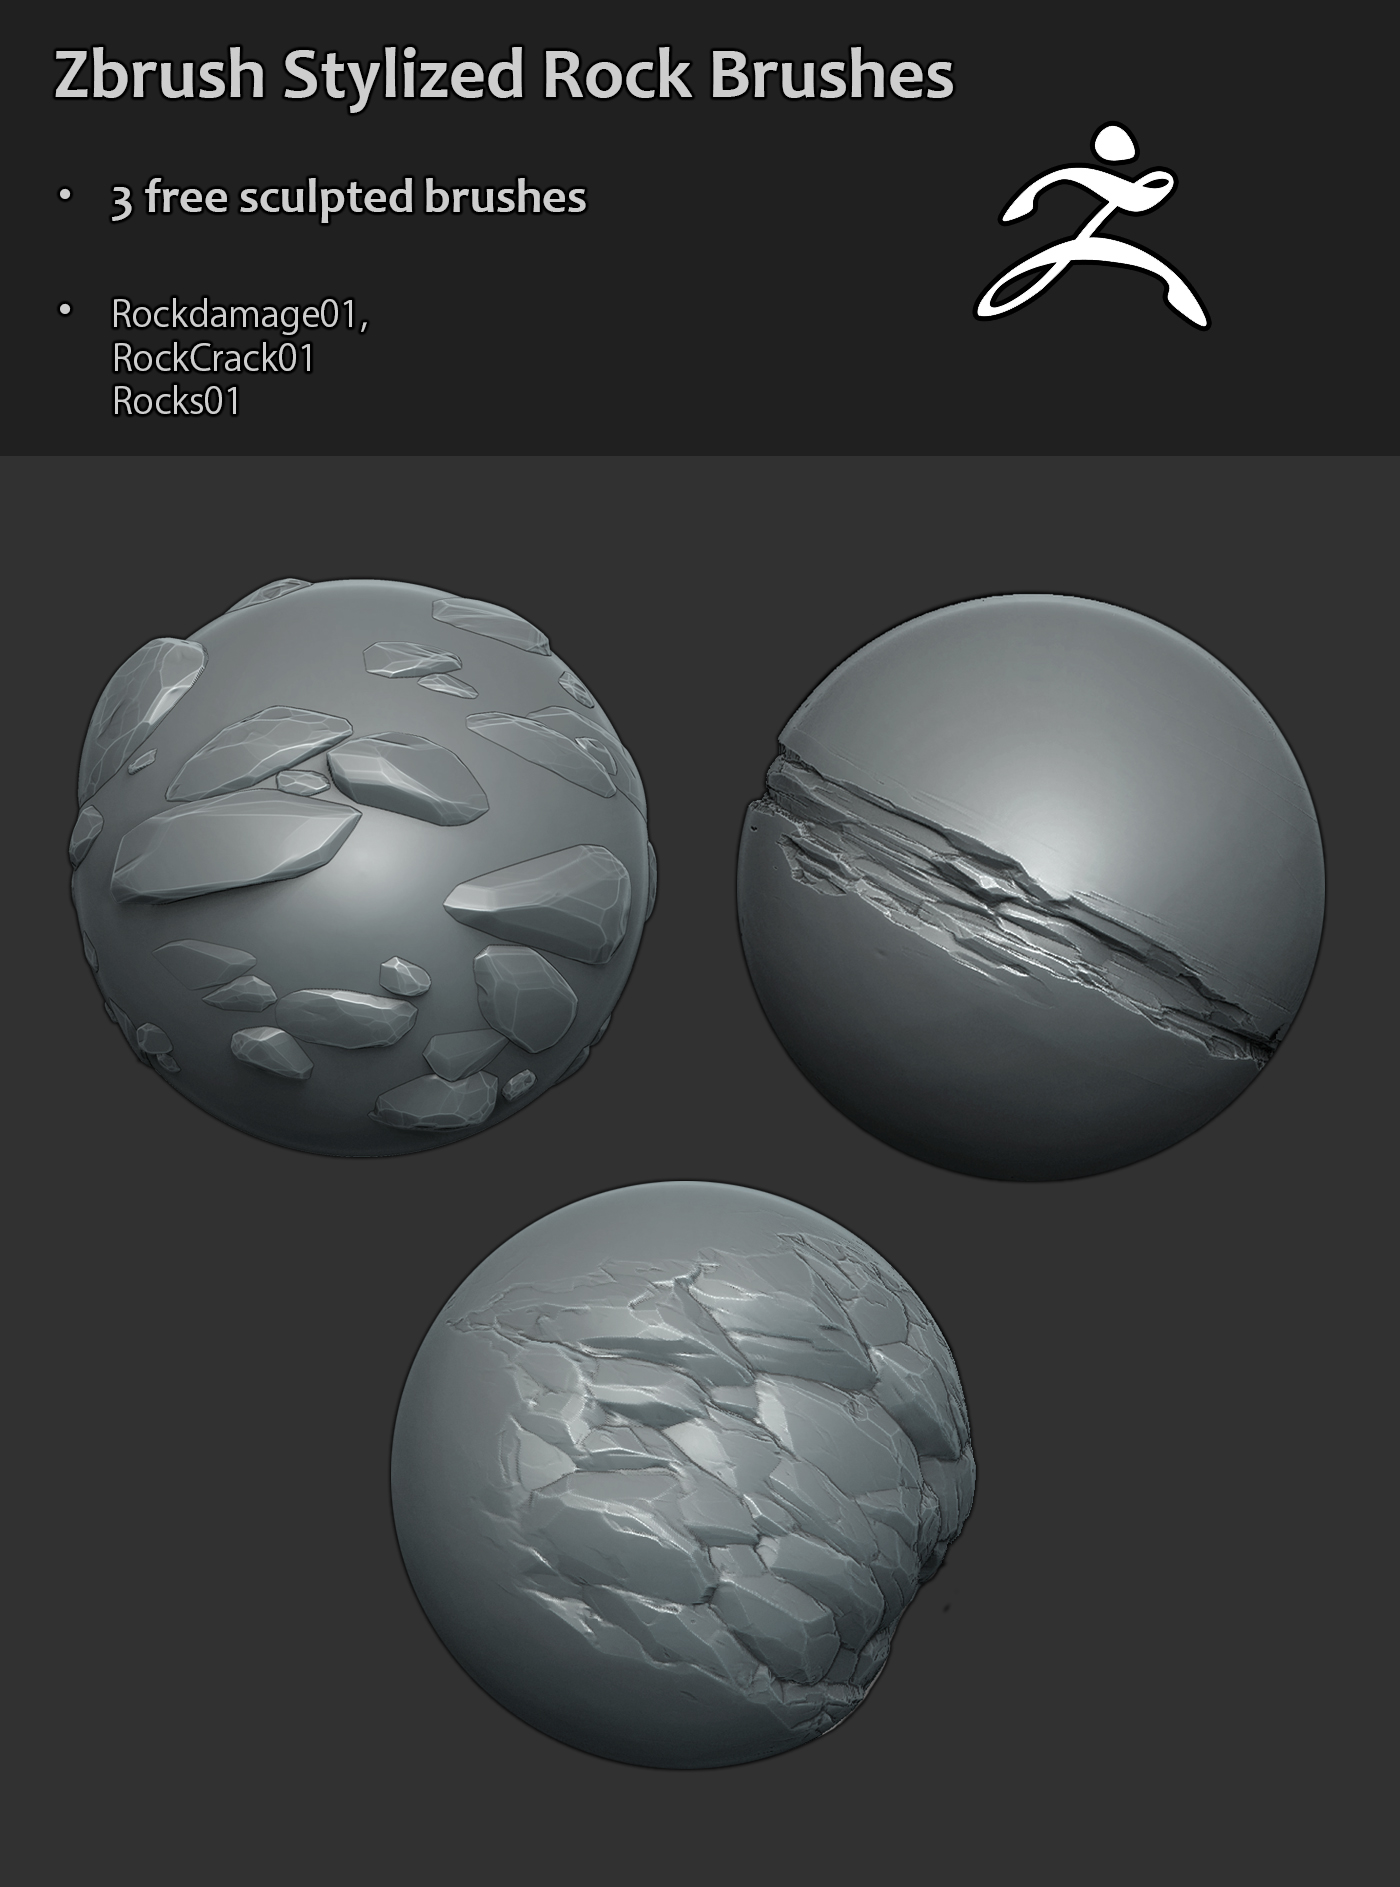 Free Zbrush Brushes by jronn-designs on DeviantArt